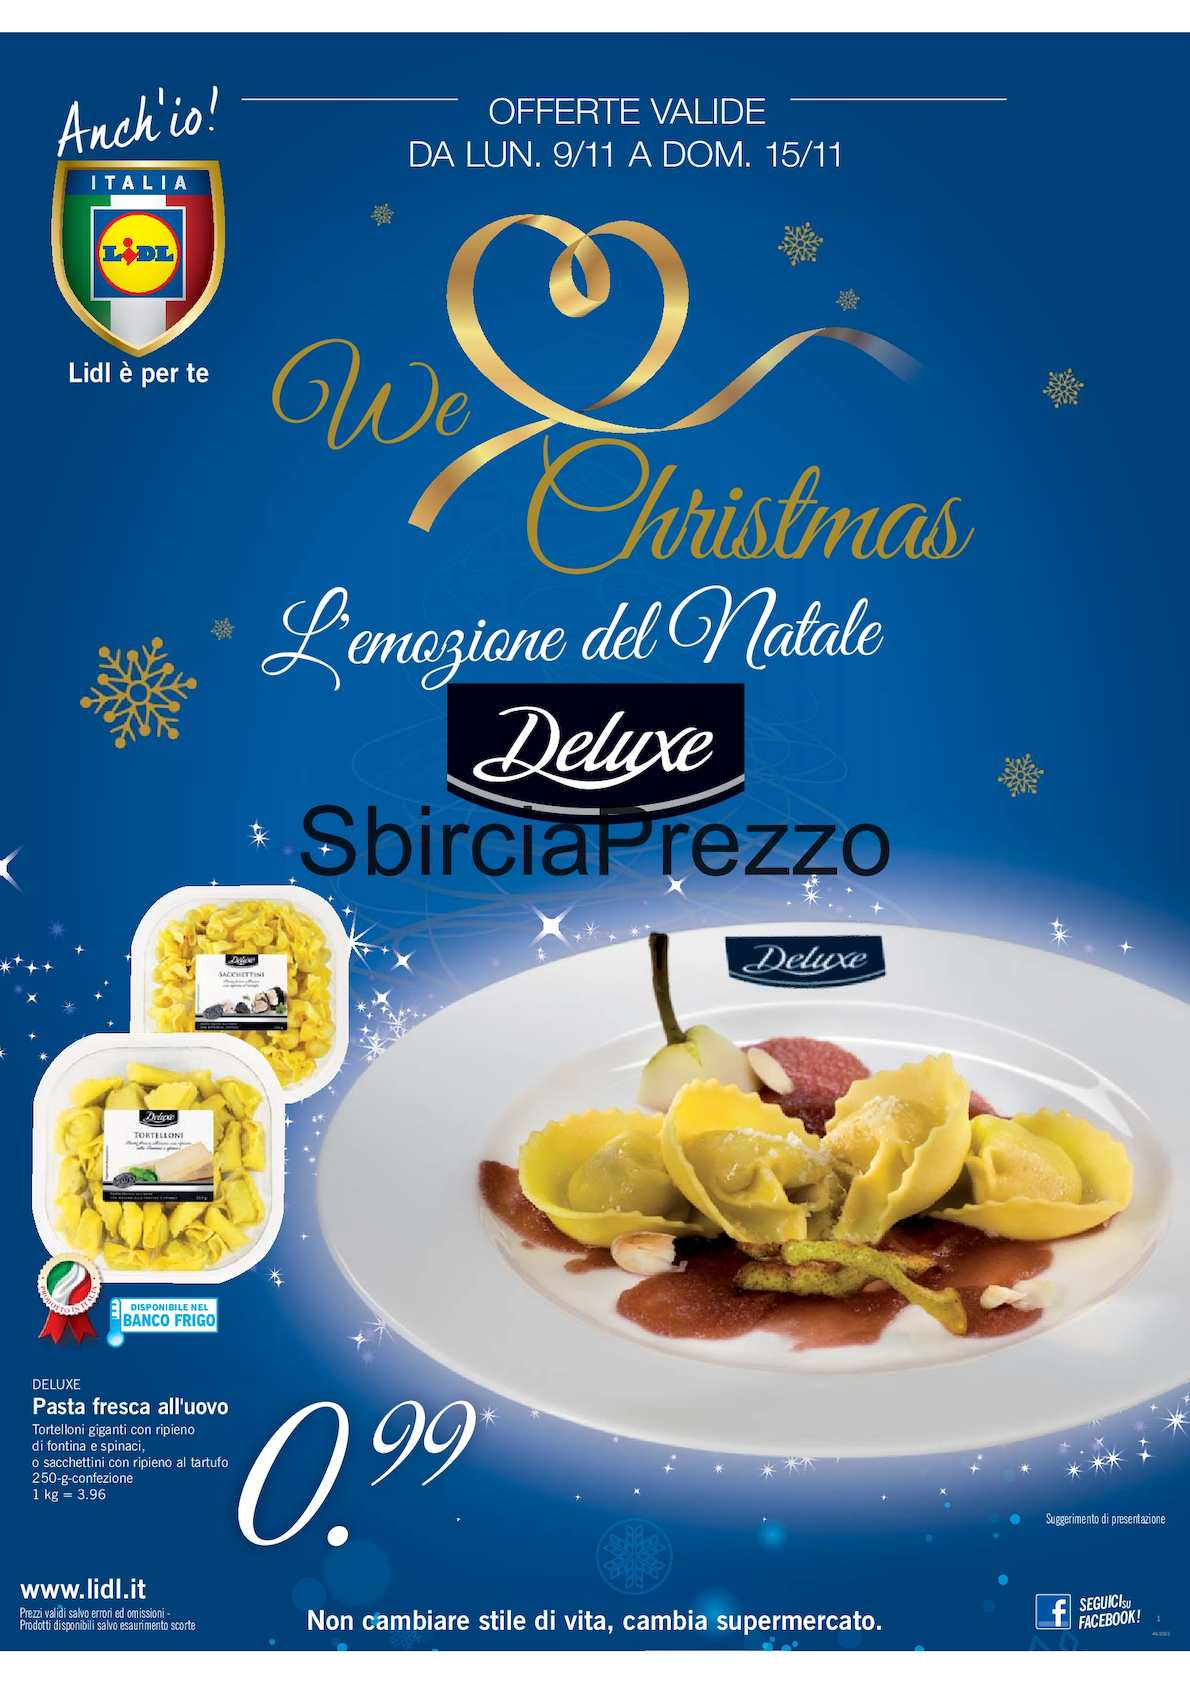 Calaméo Volantino Lidl We Love Christmas Lemozione Del Natale